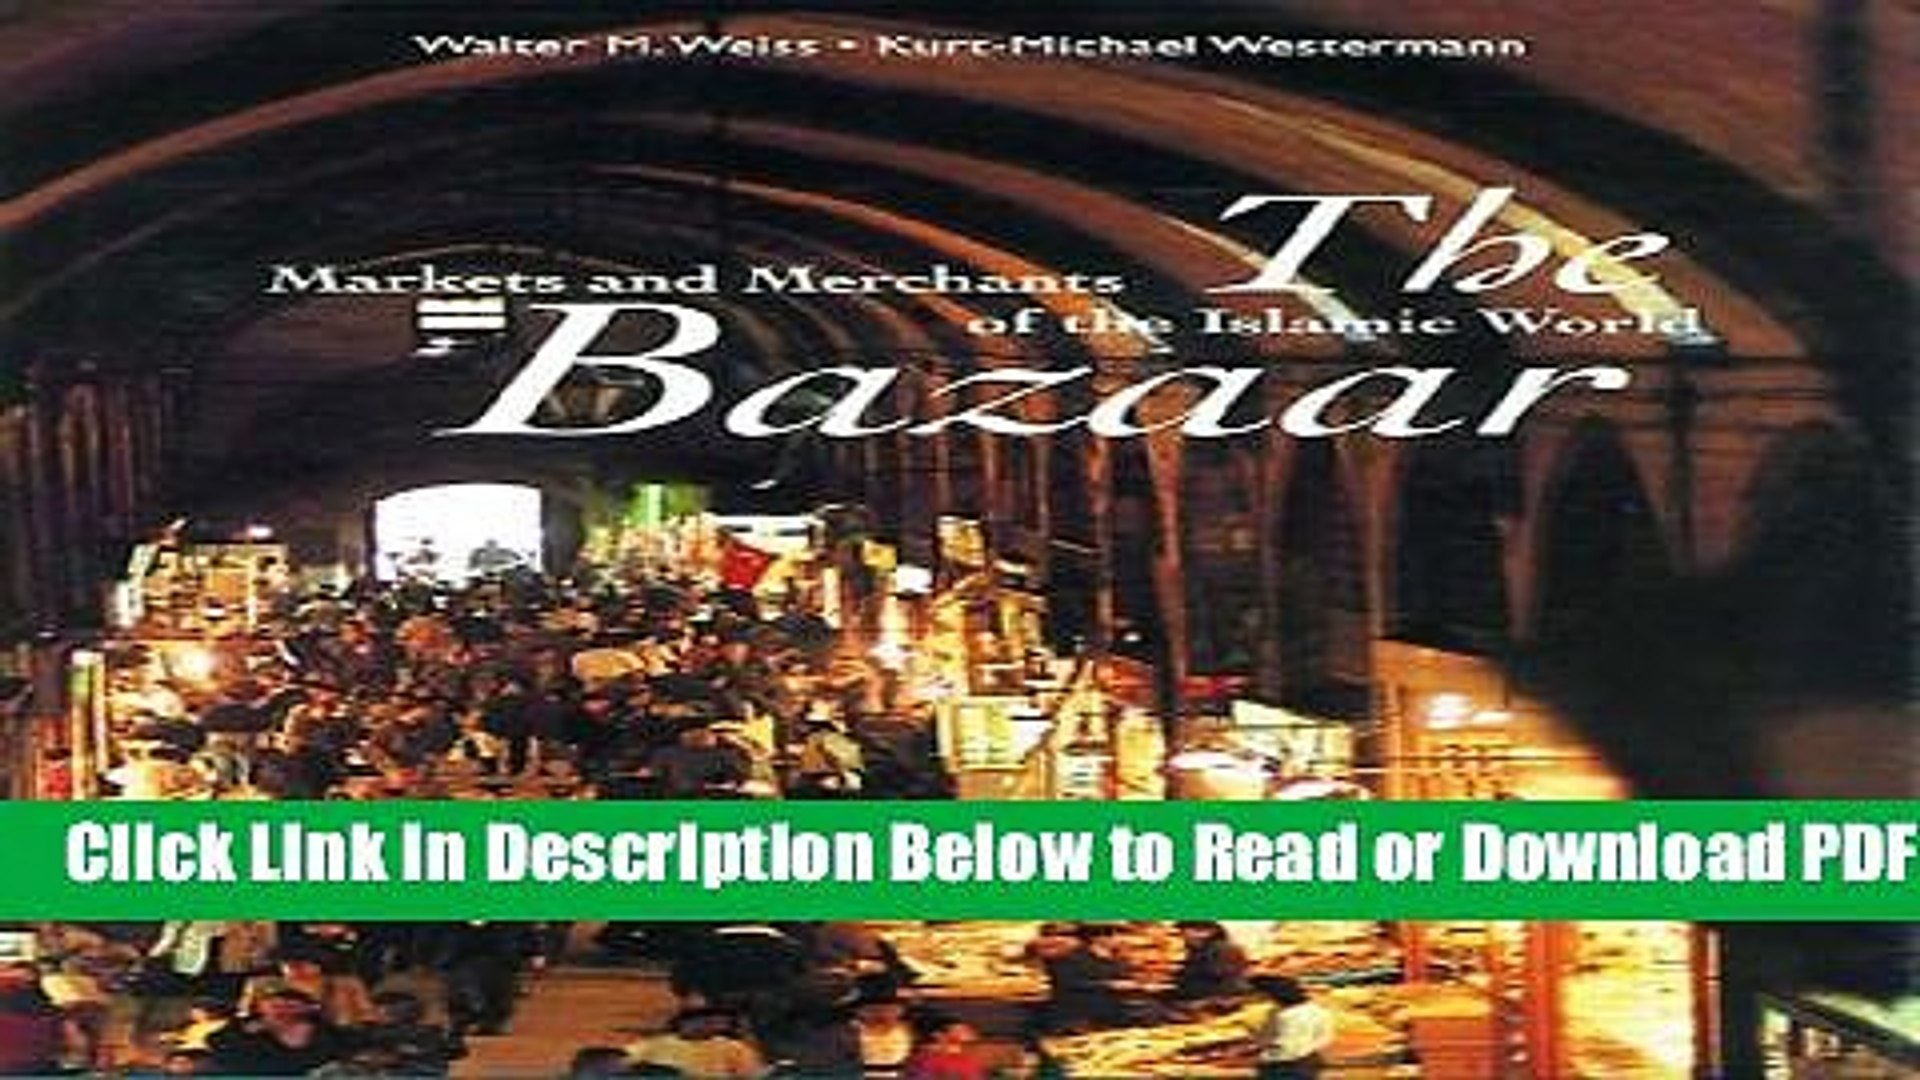 [PDF] The Bazaar: Markets and Merchants of the Islamic World Free New